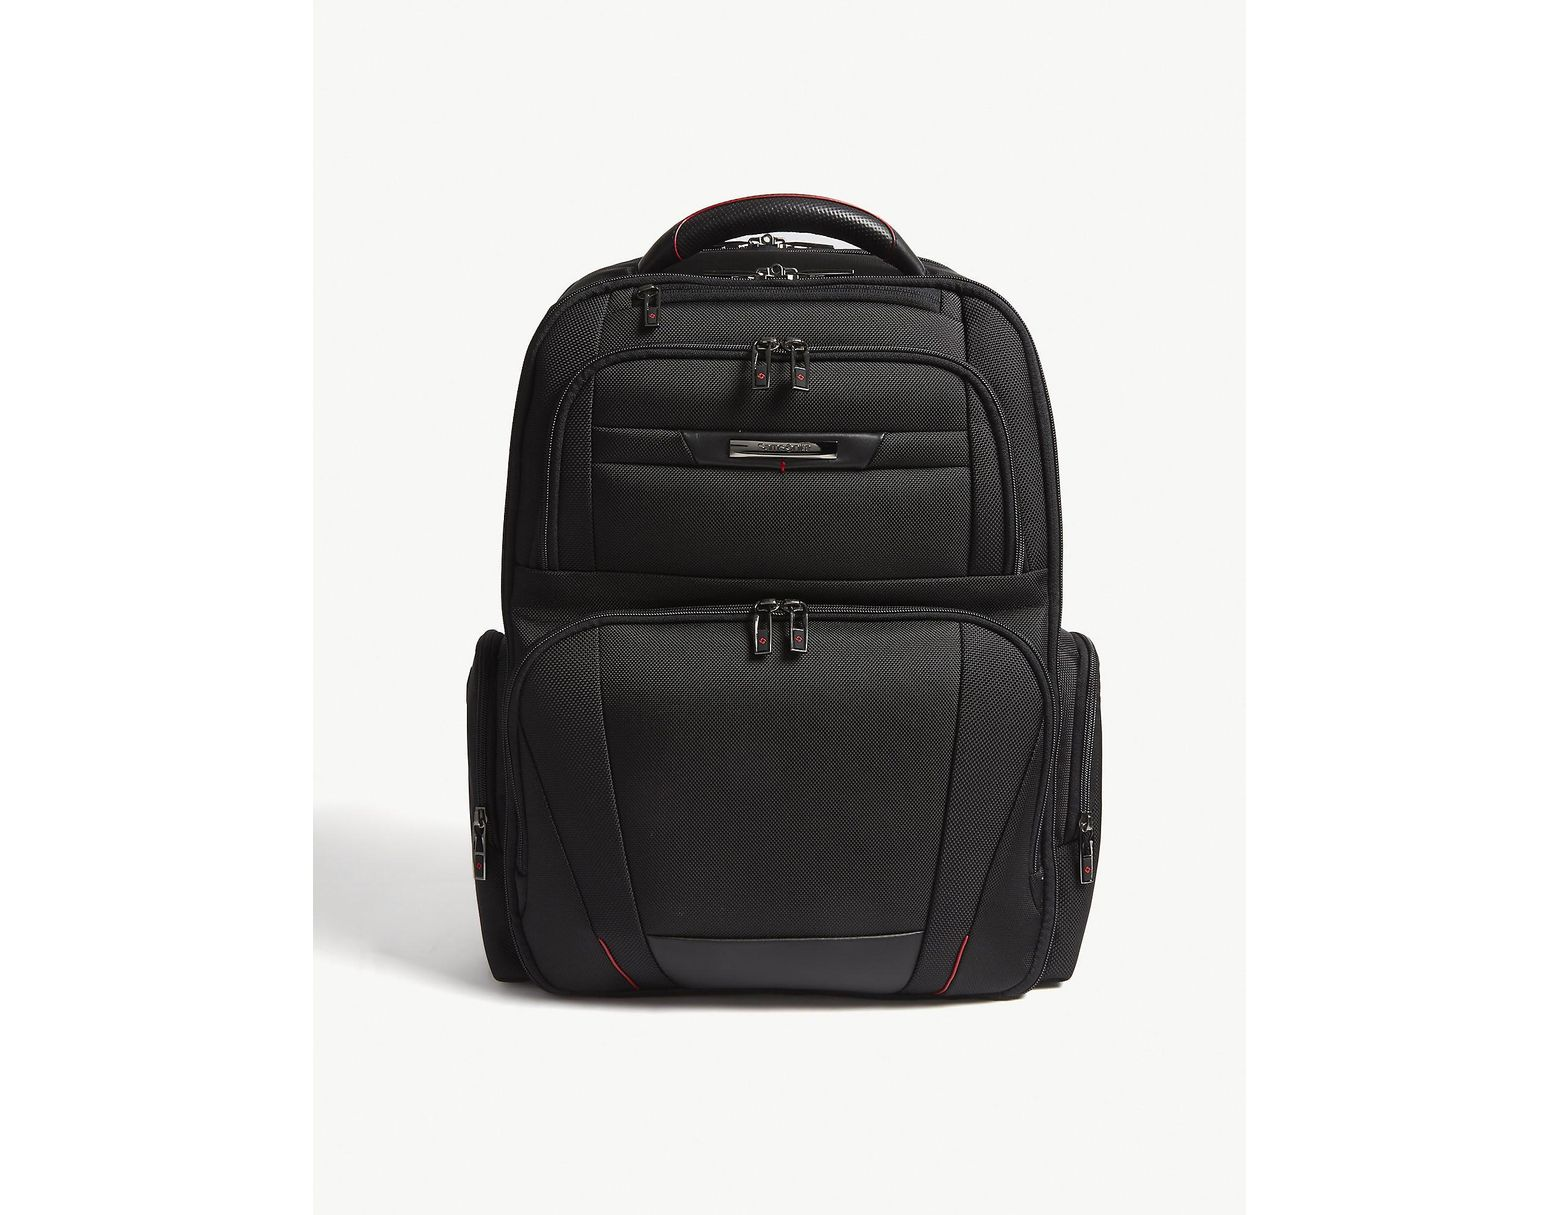 86530013e3 Samsonite Lady Tech 14.1 Laptop Backpack